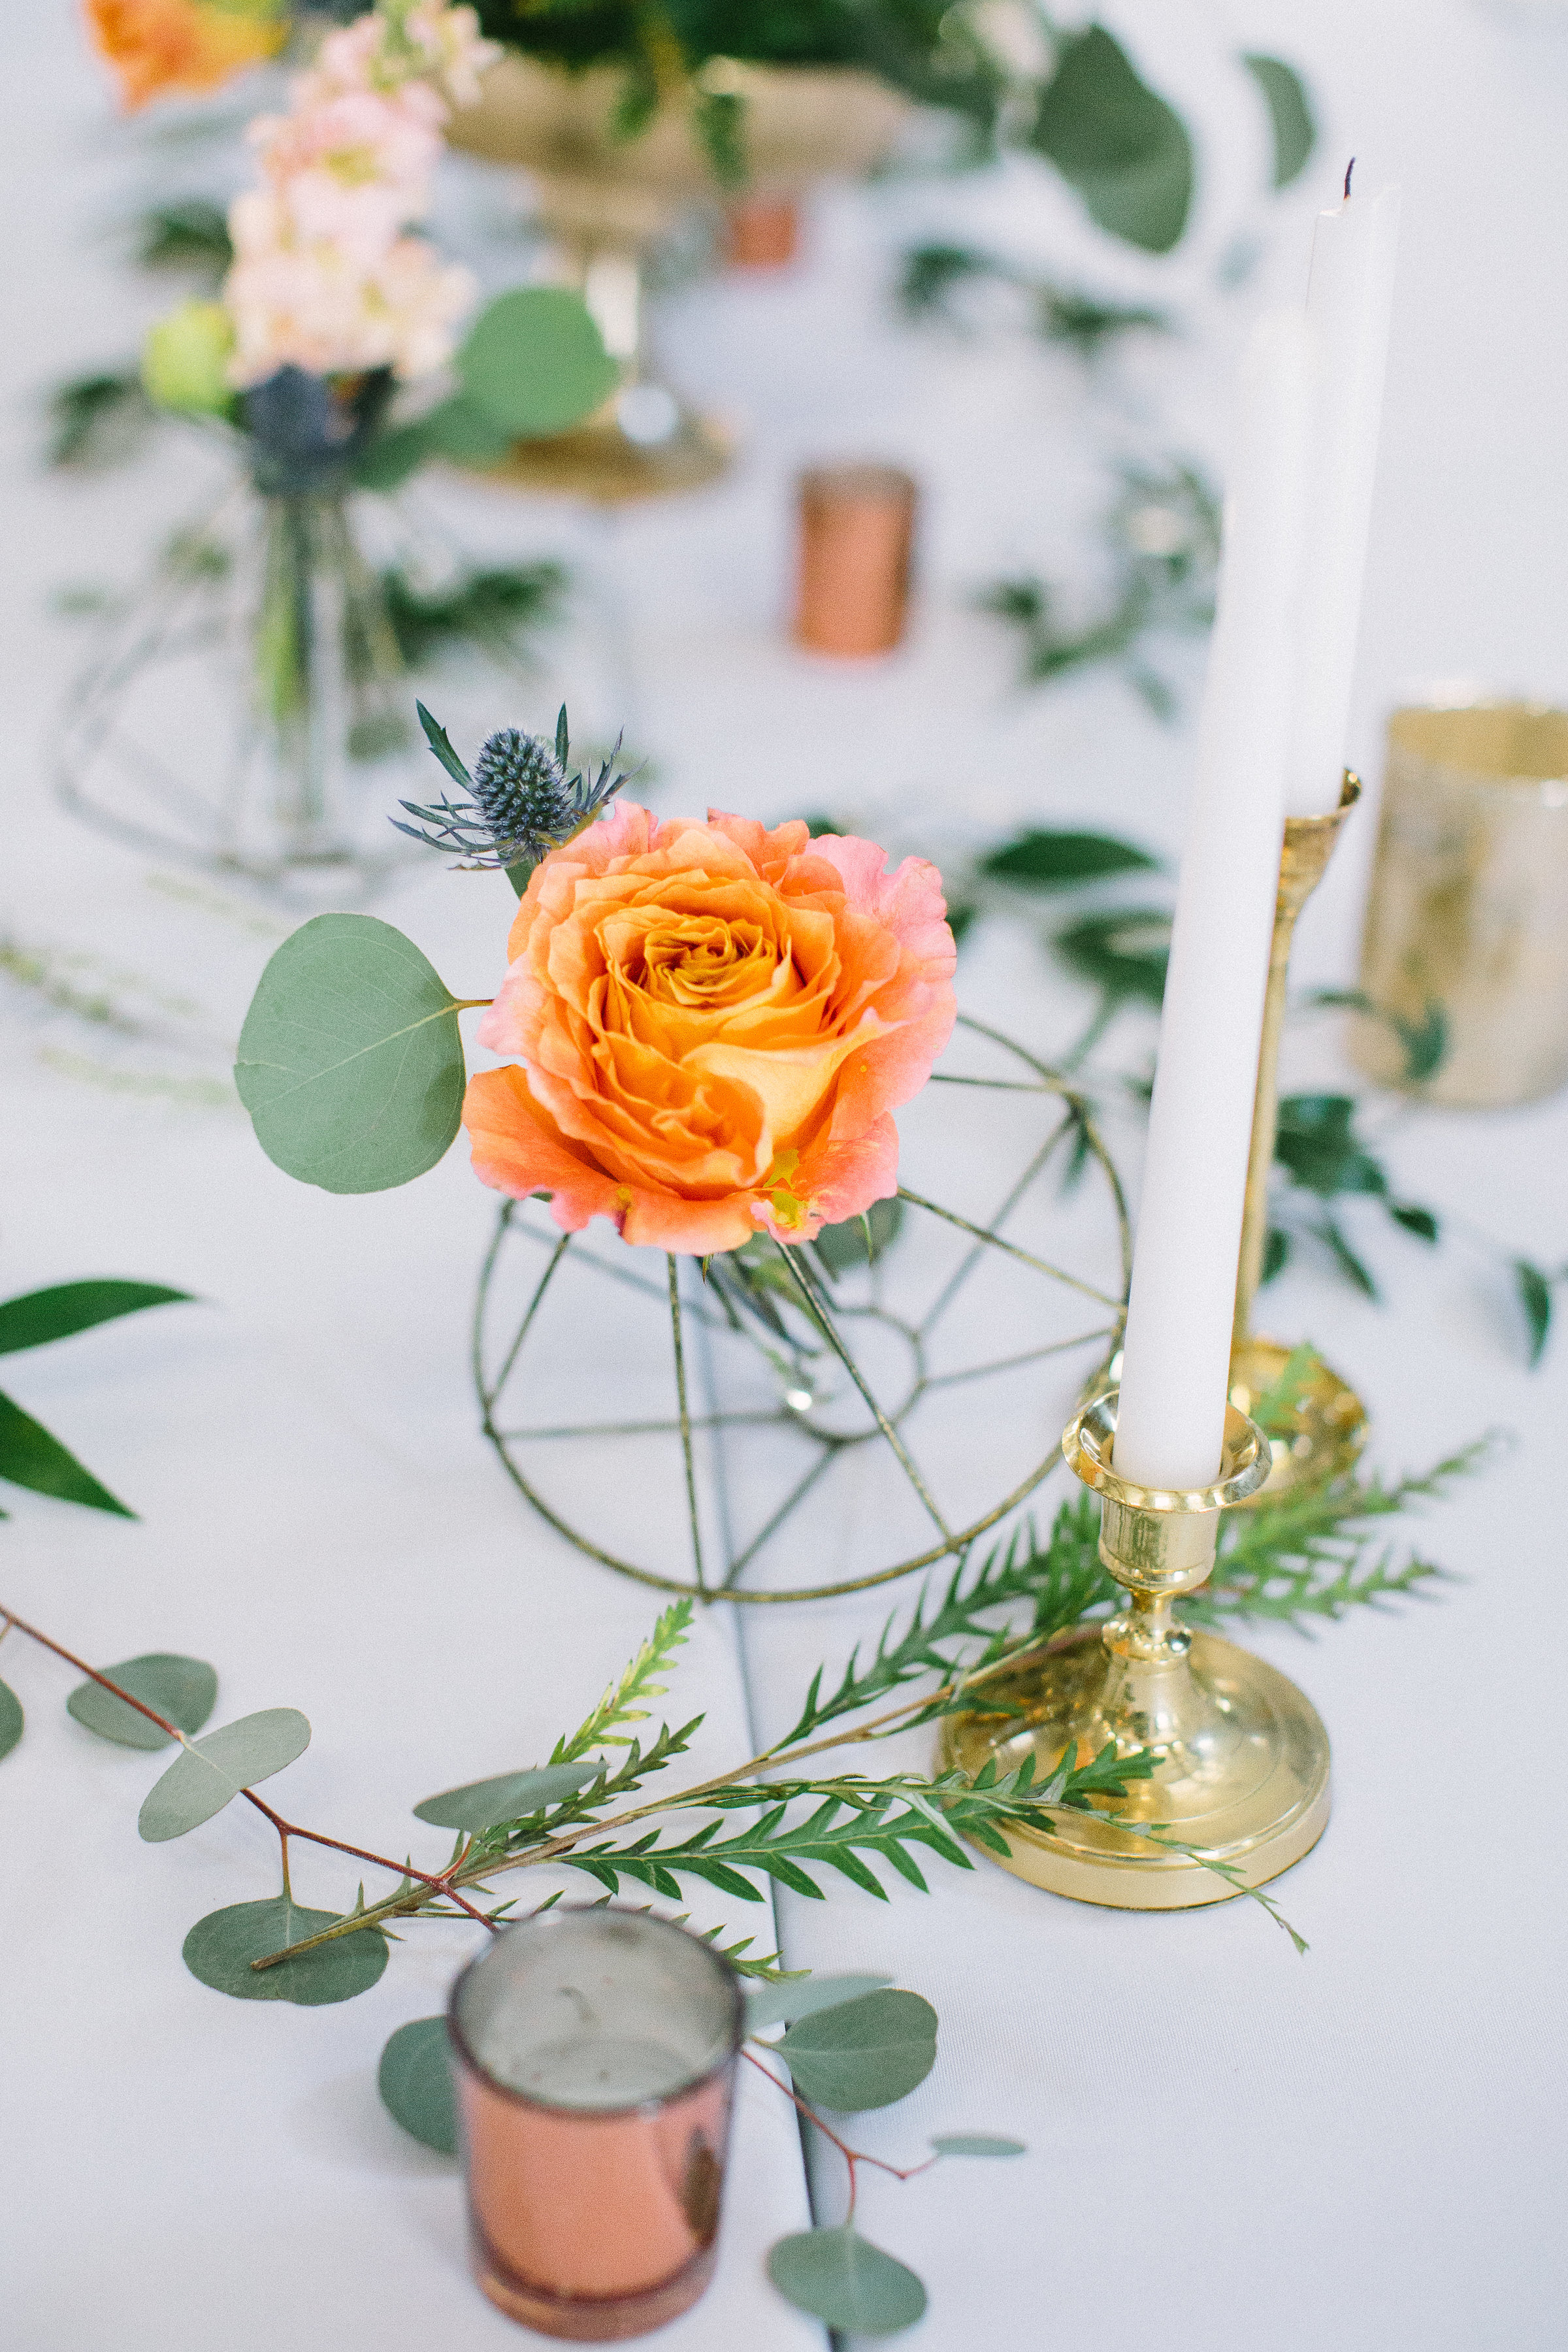 Ellen-Ashton-Photography-Peach-Creek-Ranch-Weddings-Wed-and-Prosper86